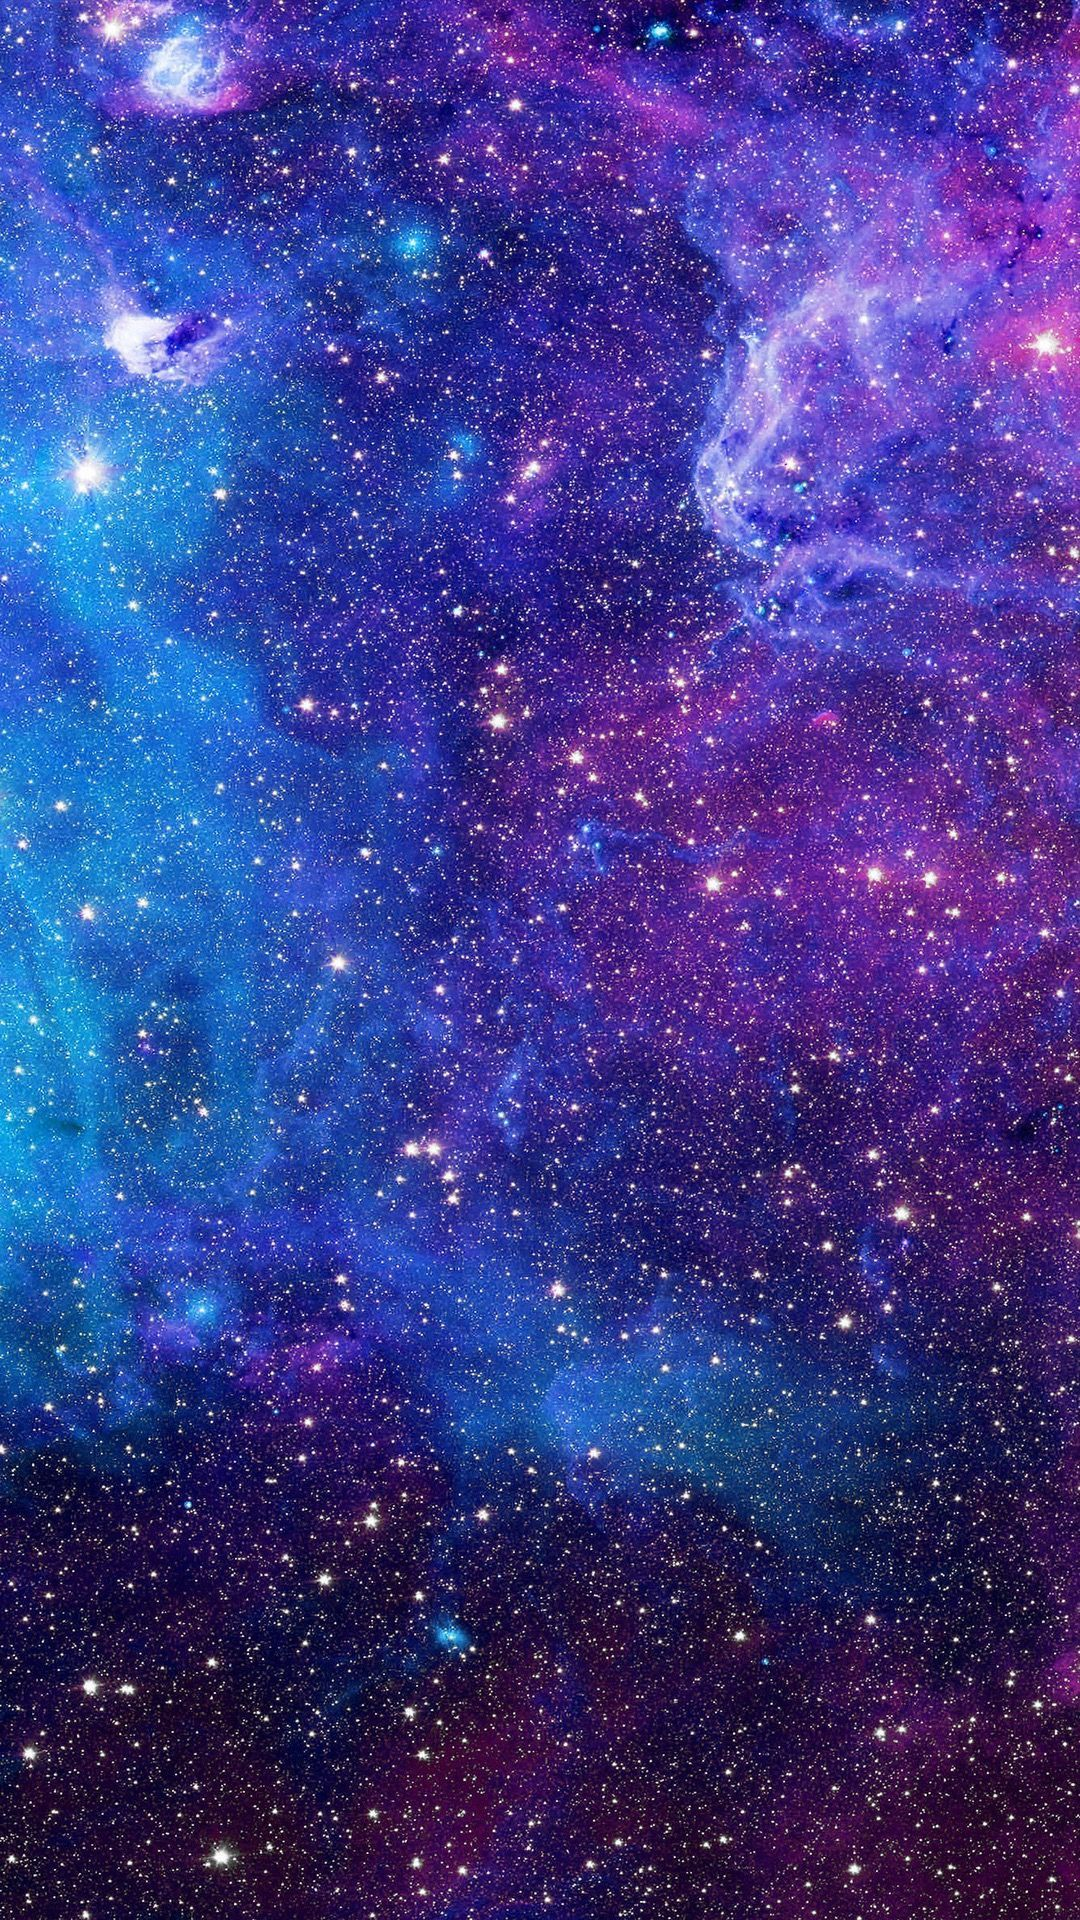 Blue Wallpaper Iphone Purple Galaxy Wallpaper Galaxies Wallpaper Galaxy Wallpaper